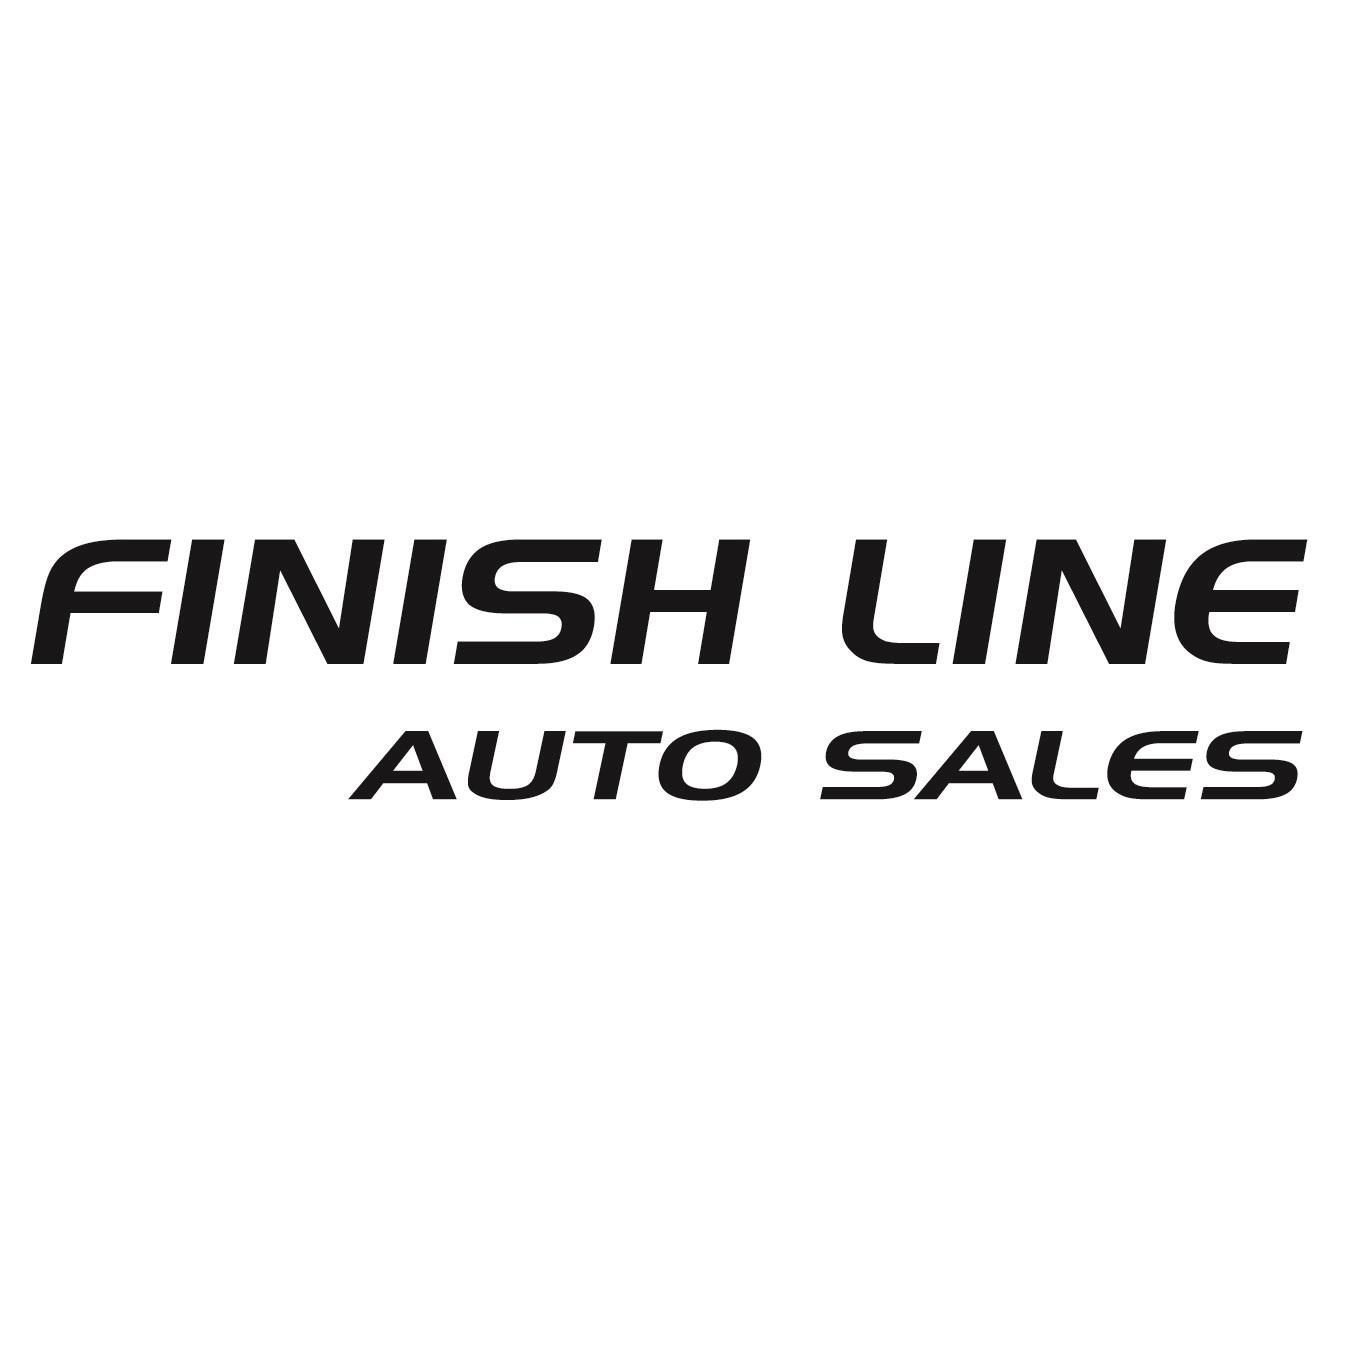 Finish Line Auto Sales